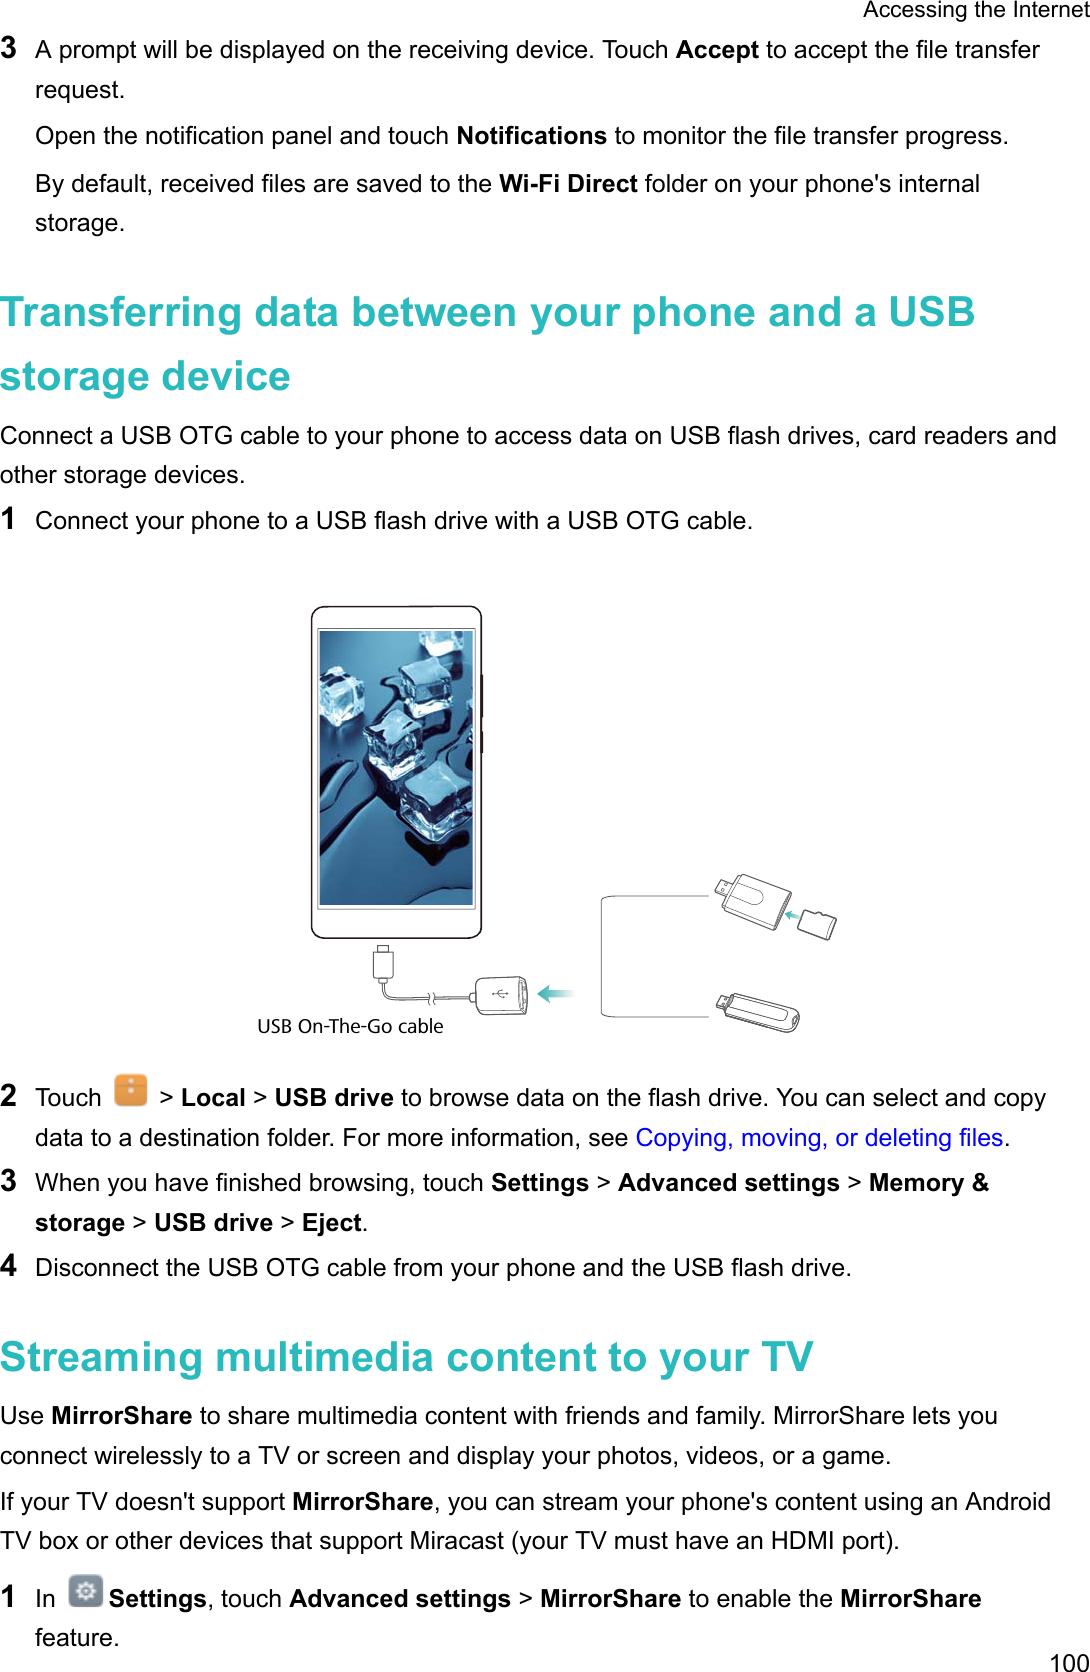 Huawei Honor 6X User Guide(BLN L21&L22, 01, En, Normal)